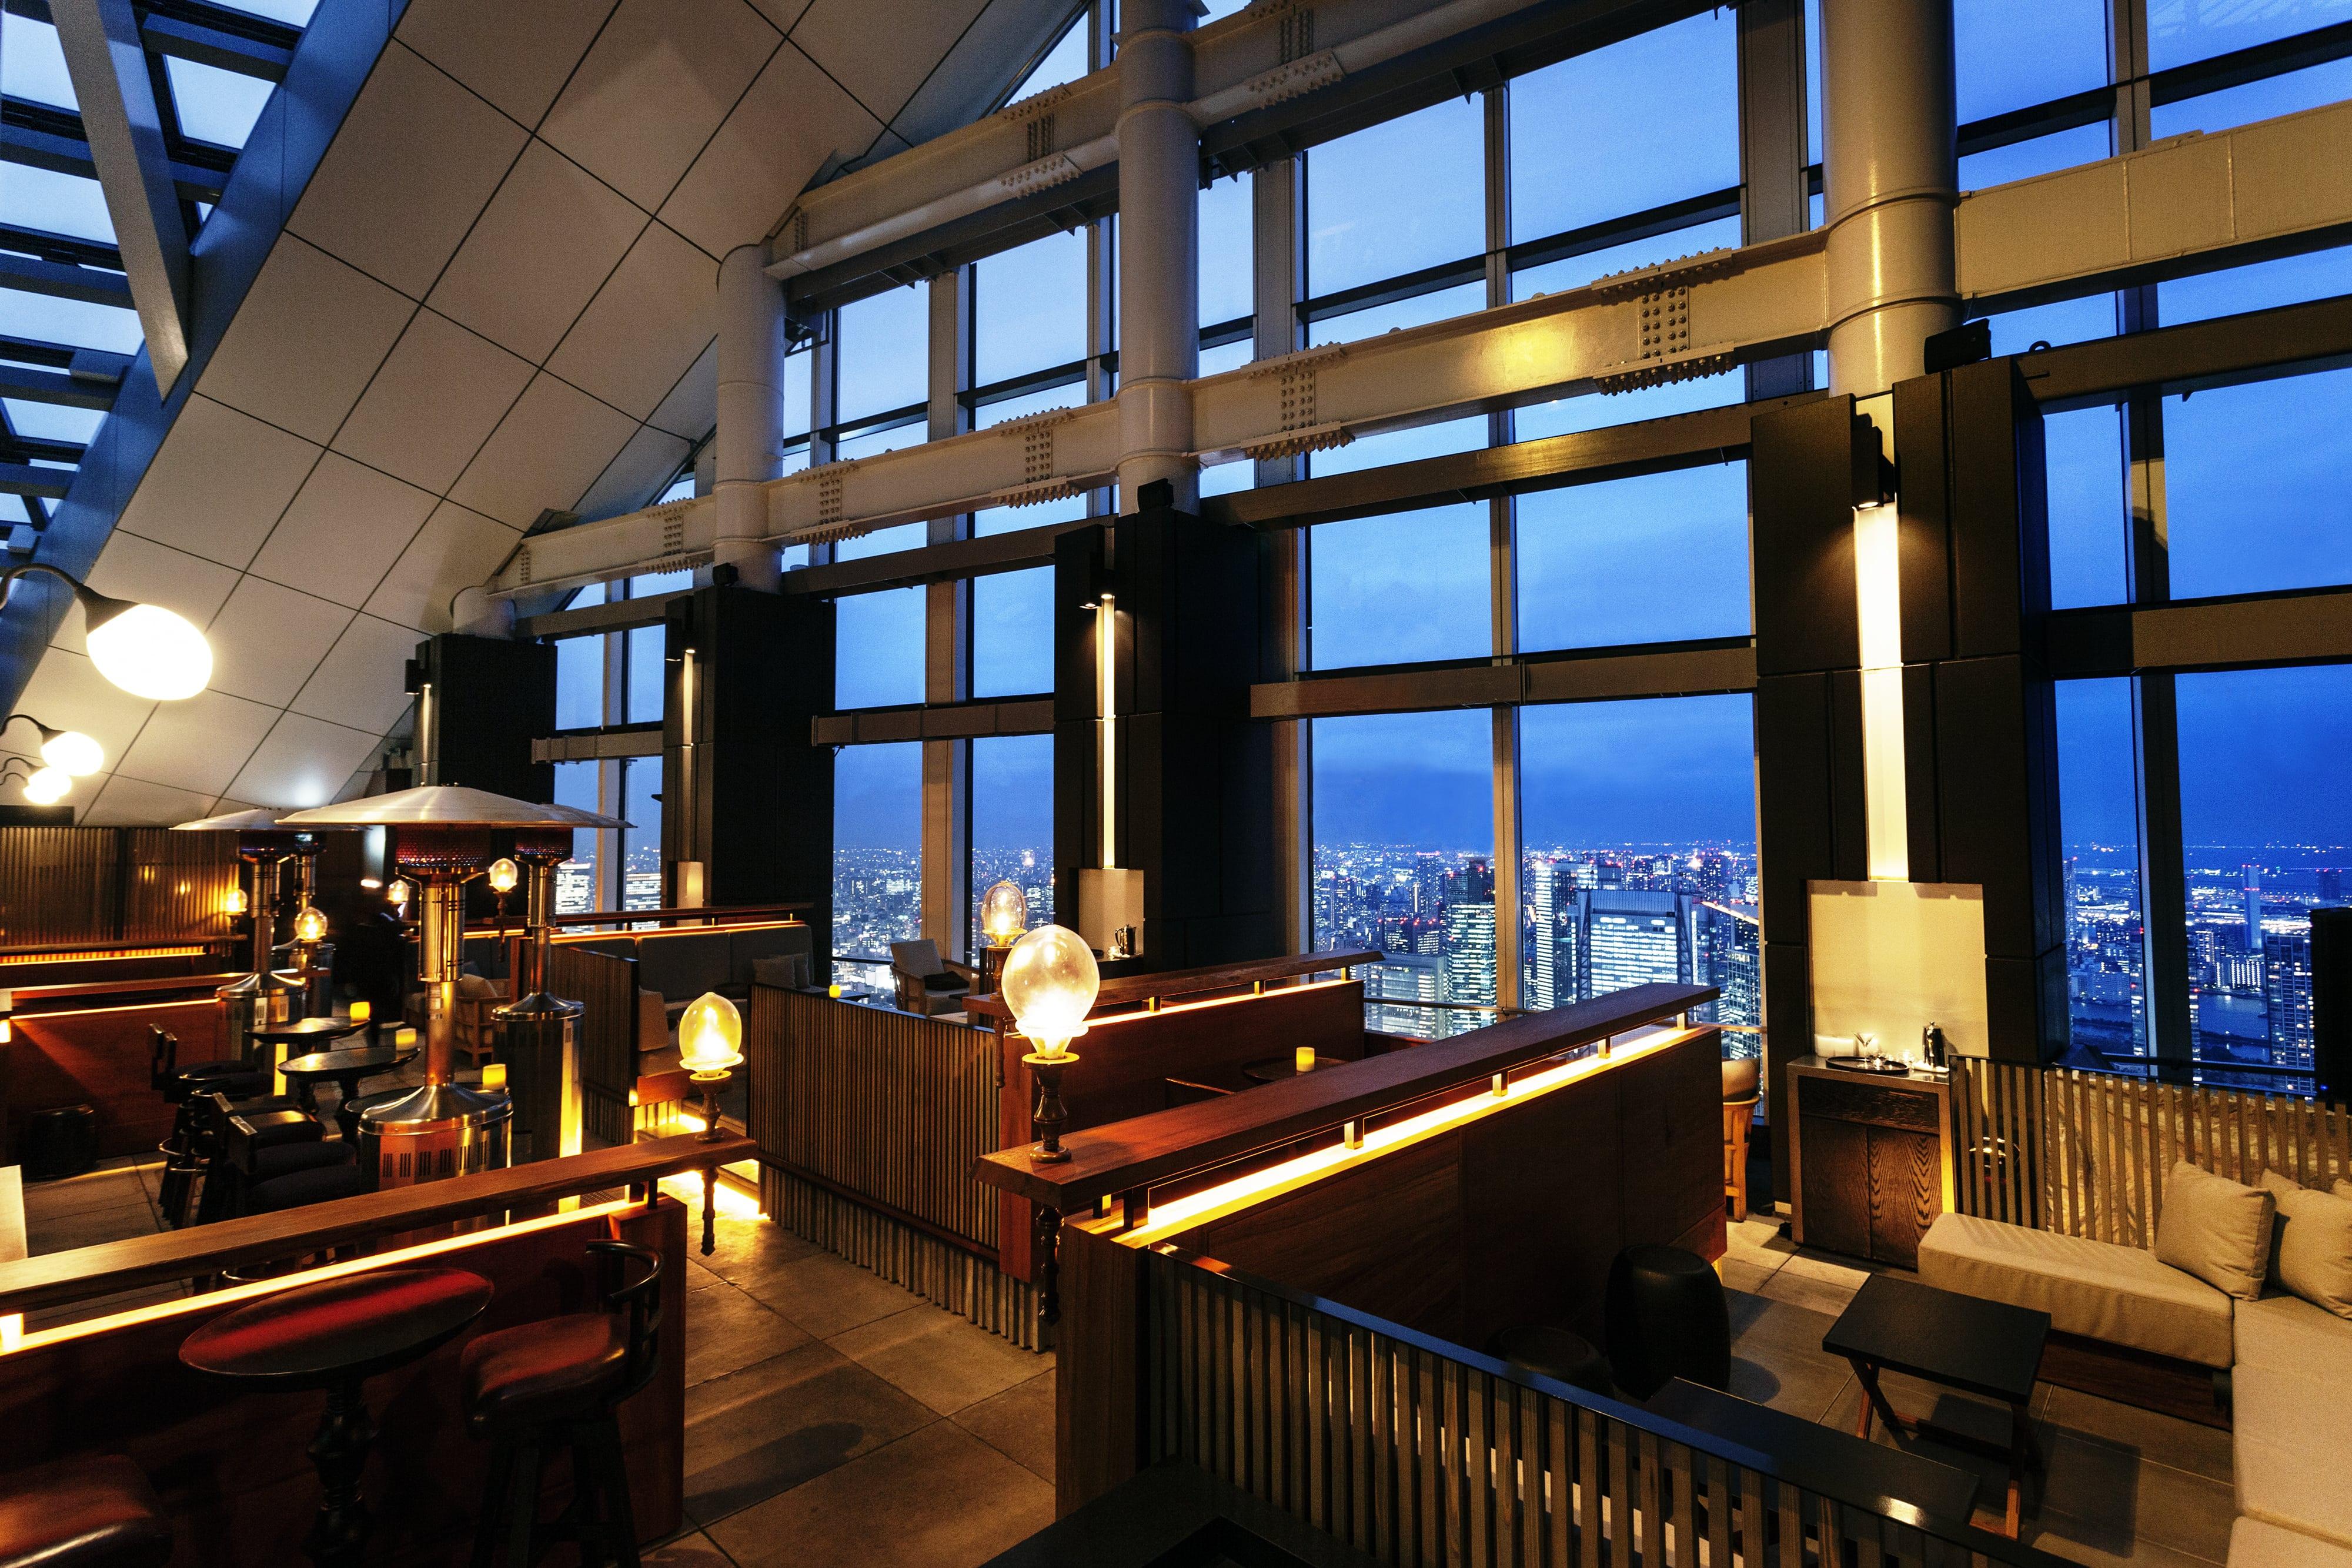 Rooftop Bar (Andaz Tokyo) restaurant view